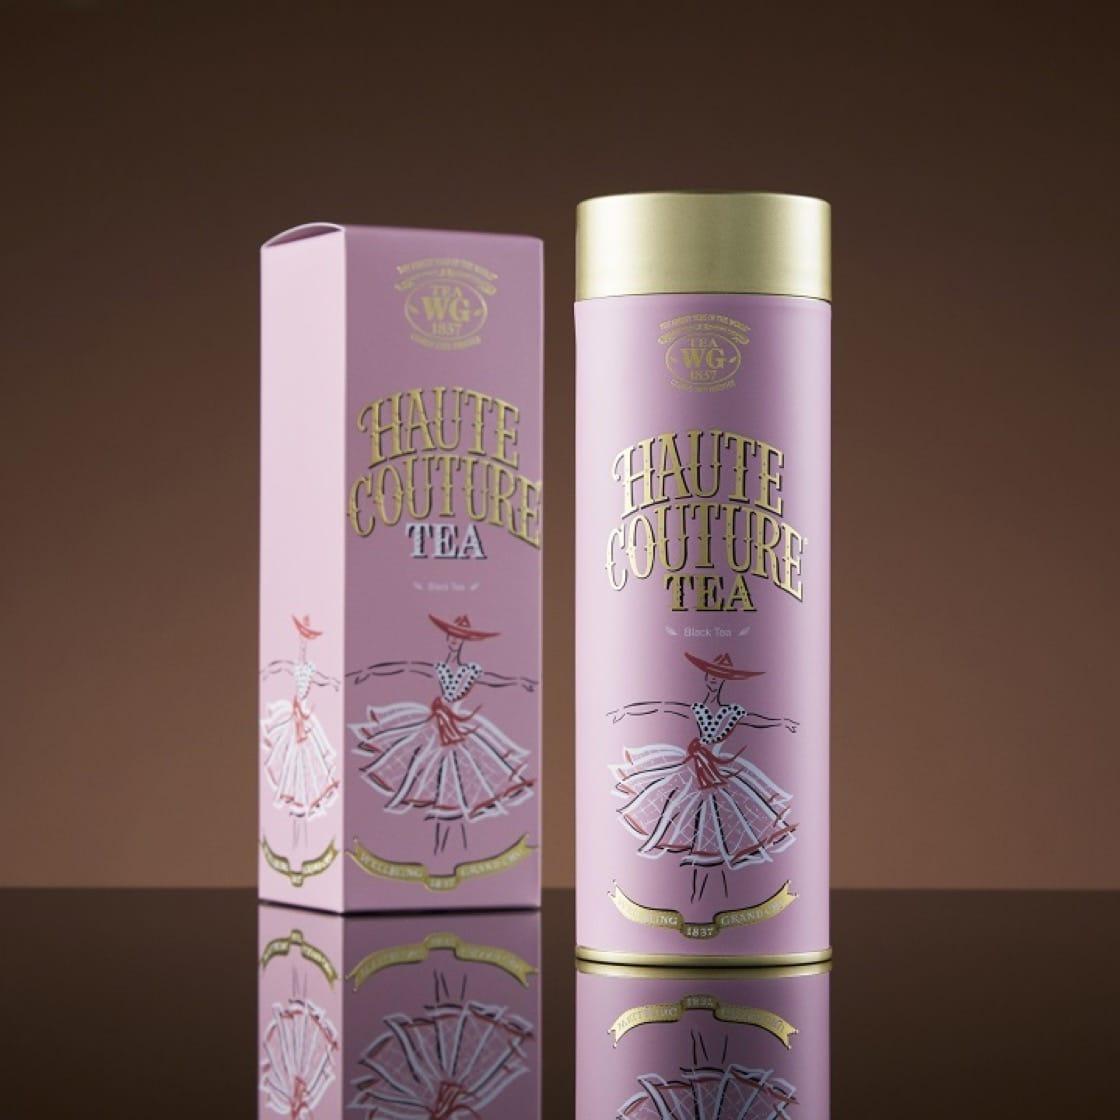 TEA WG假期推出特別組合,新加坡和香港推出特別訂製茶Haute Couture Tea(圖片:TEA WG)